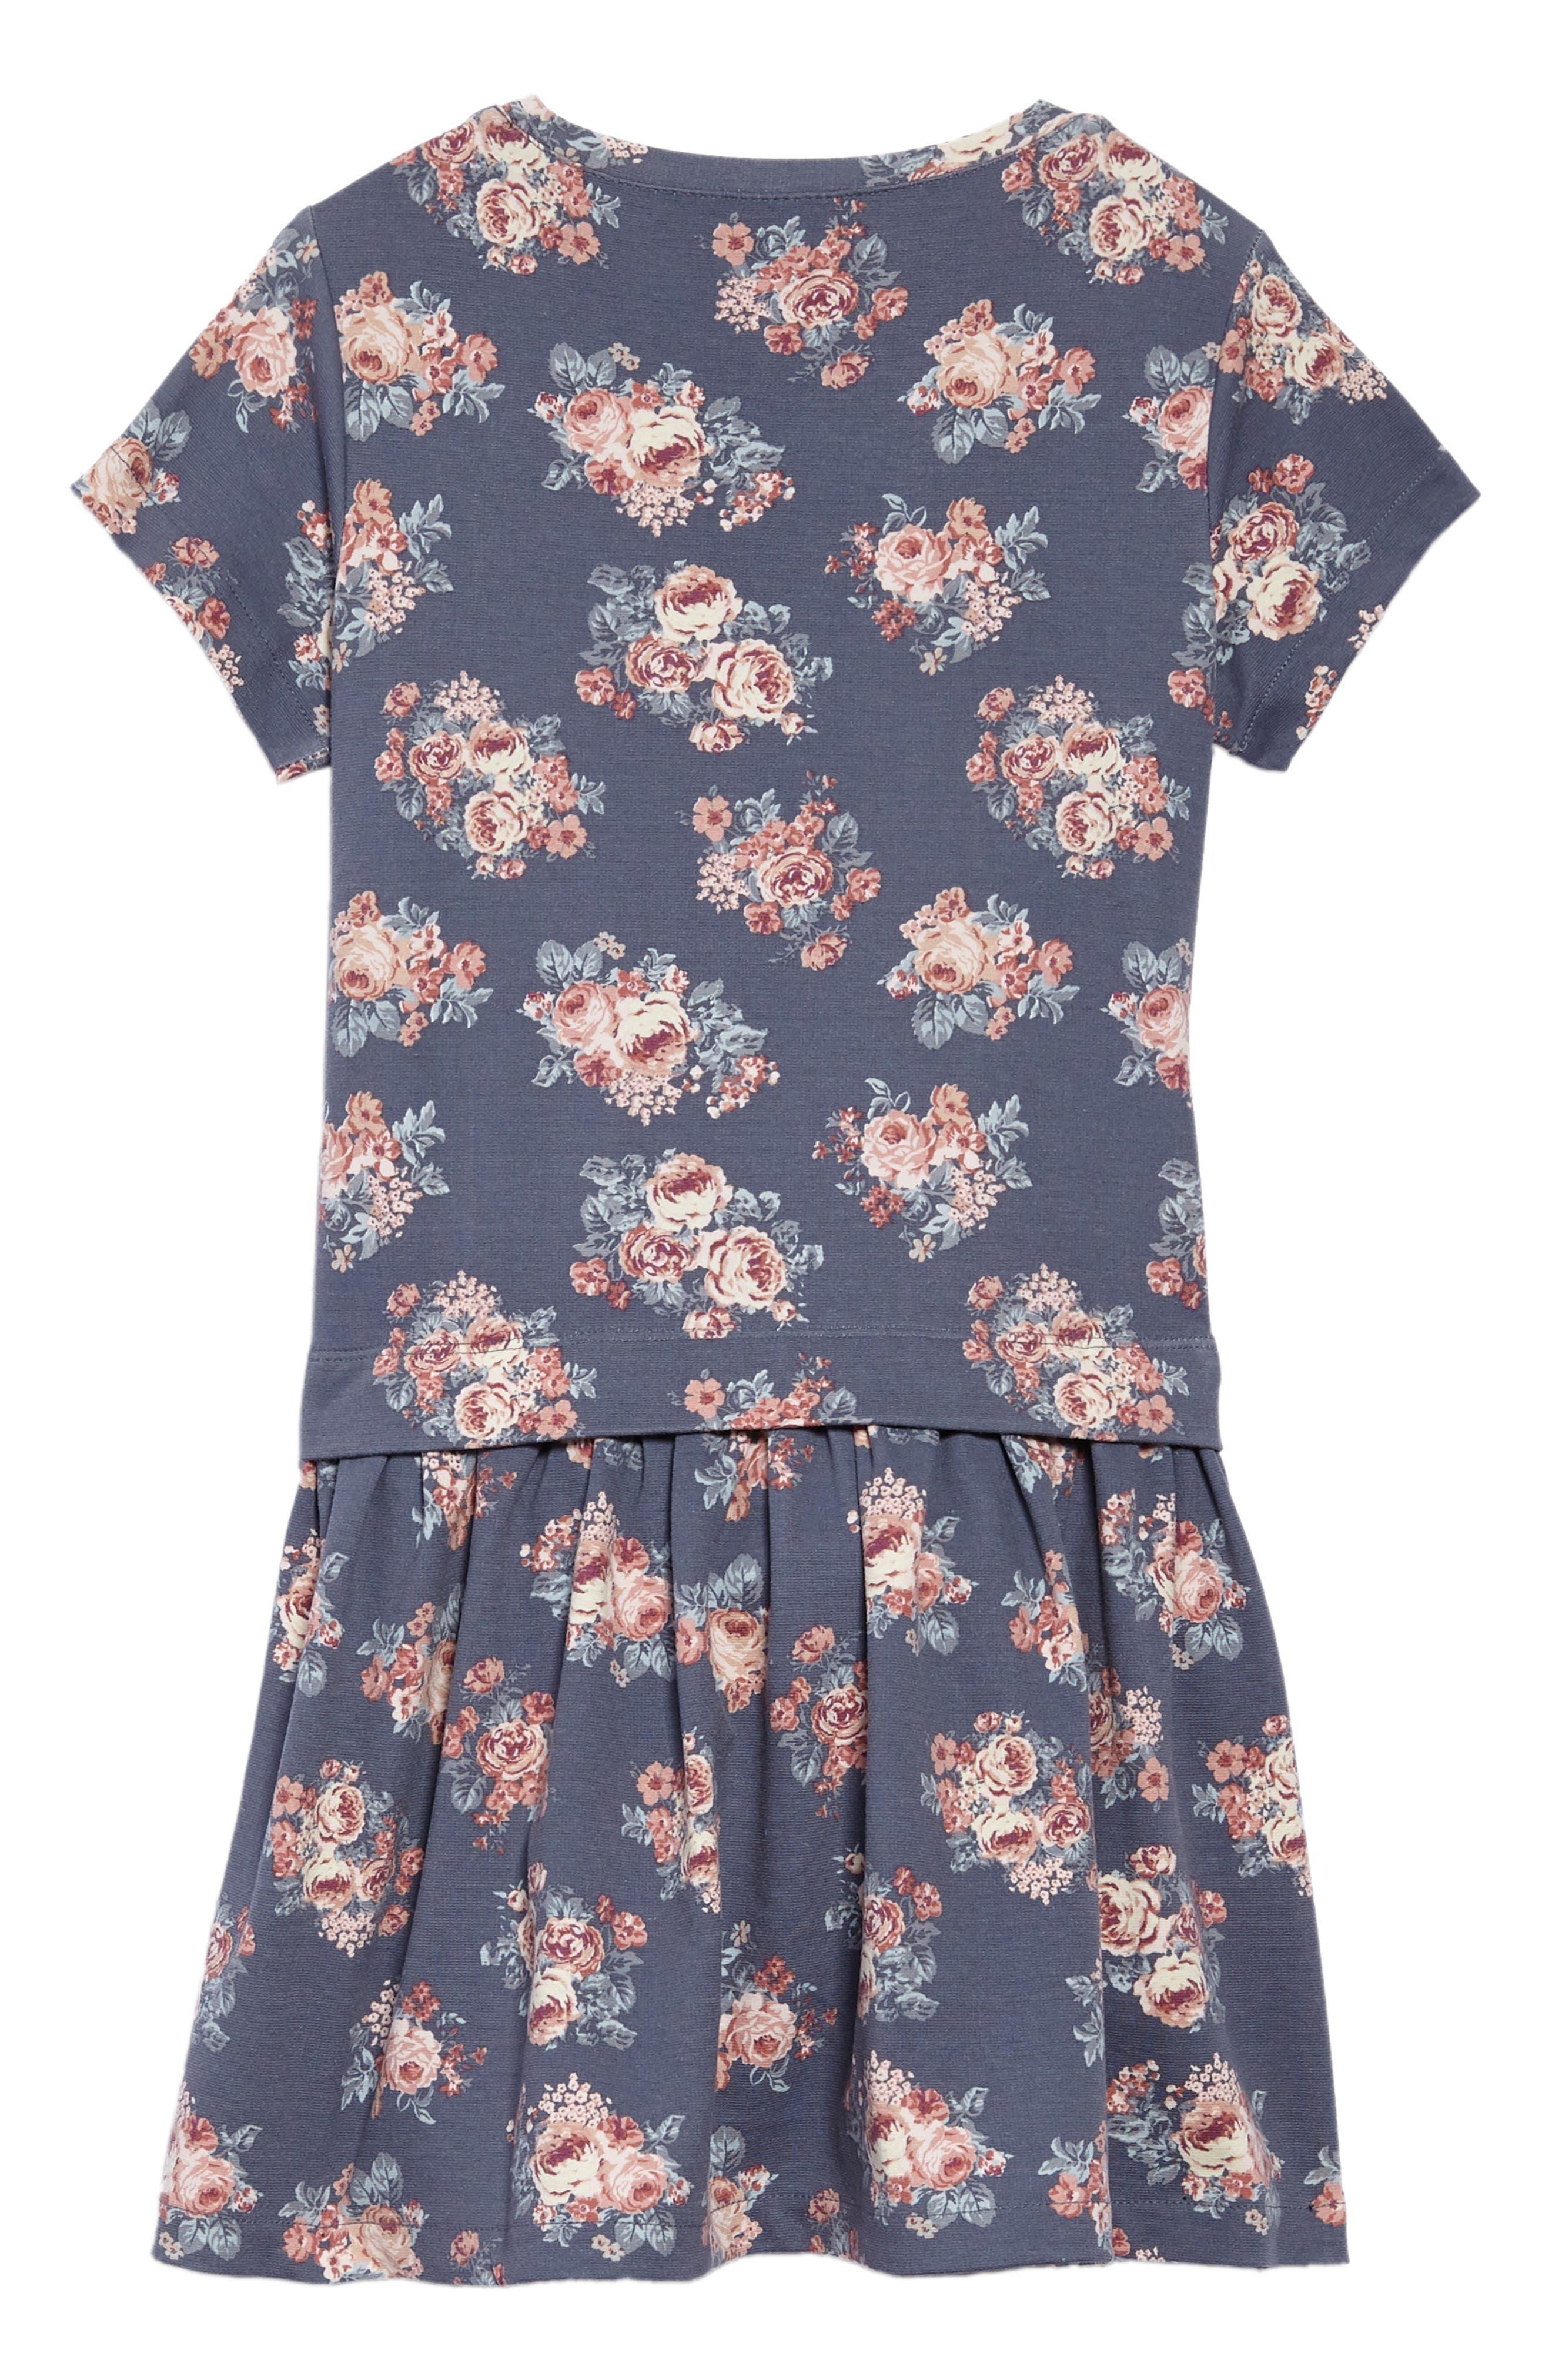 Michella Floral Print Dress,                             Alternate thumbnail 2, color,                             020